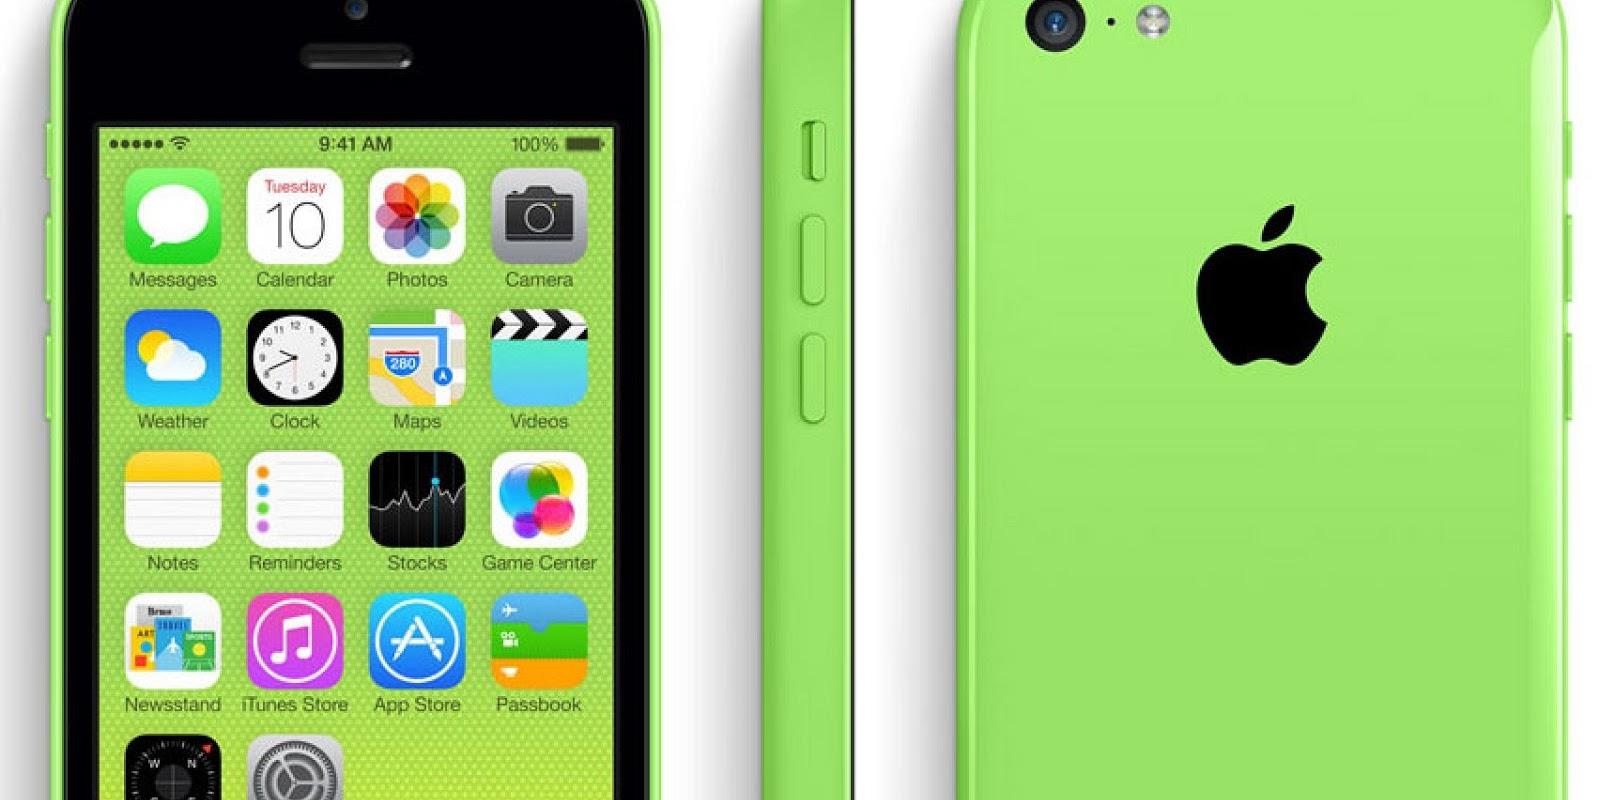 iPhone 5c Dengan Kamera 8MP Terbaru 2017 - Review Kelebihan dan kekurangan